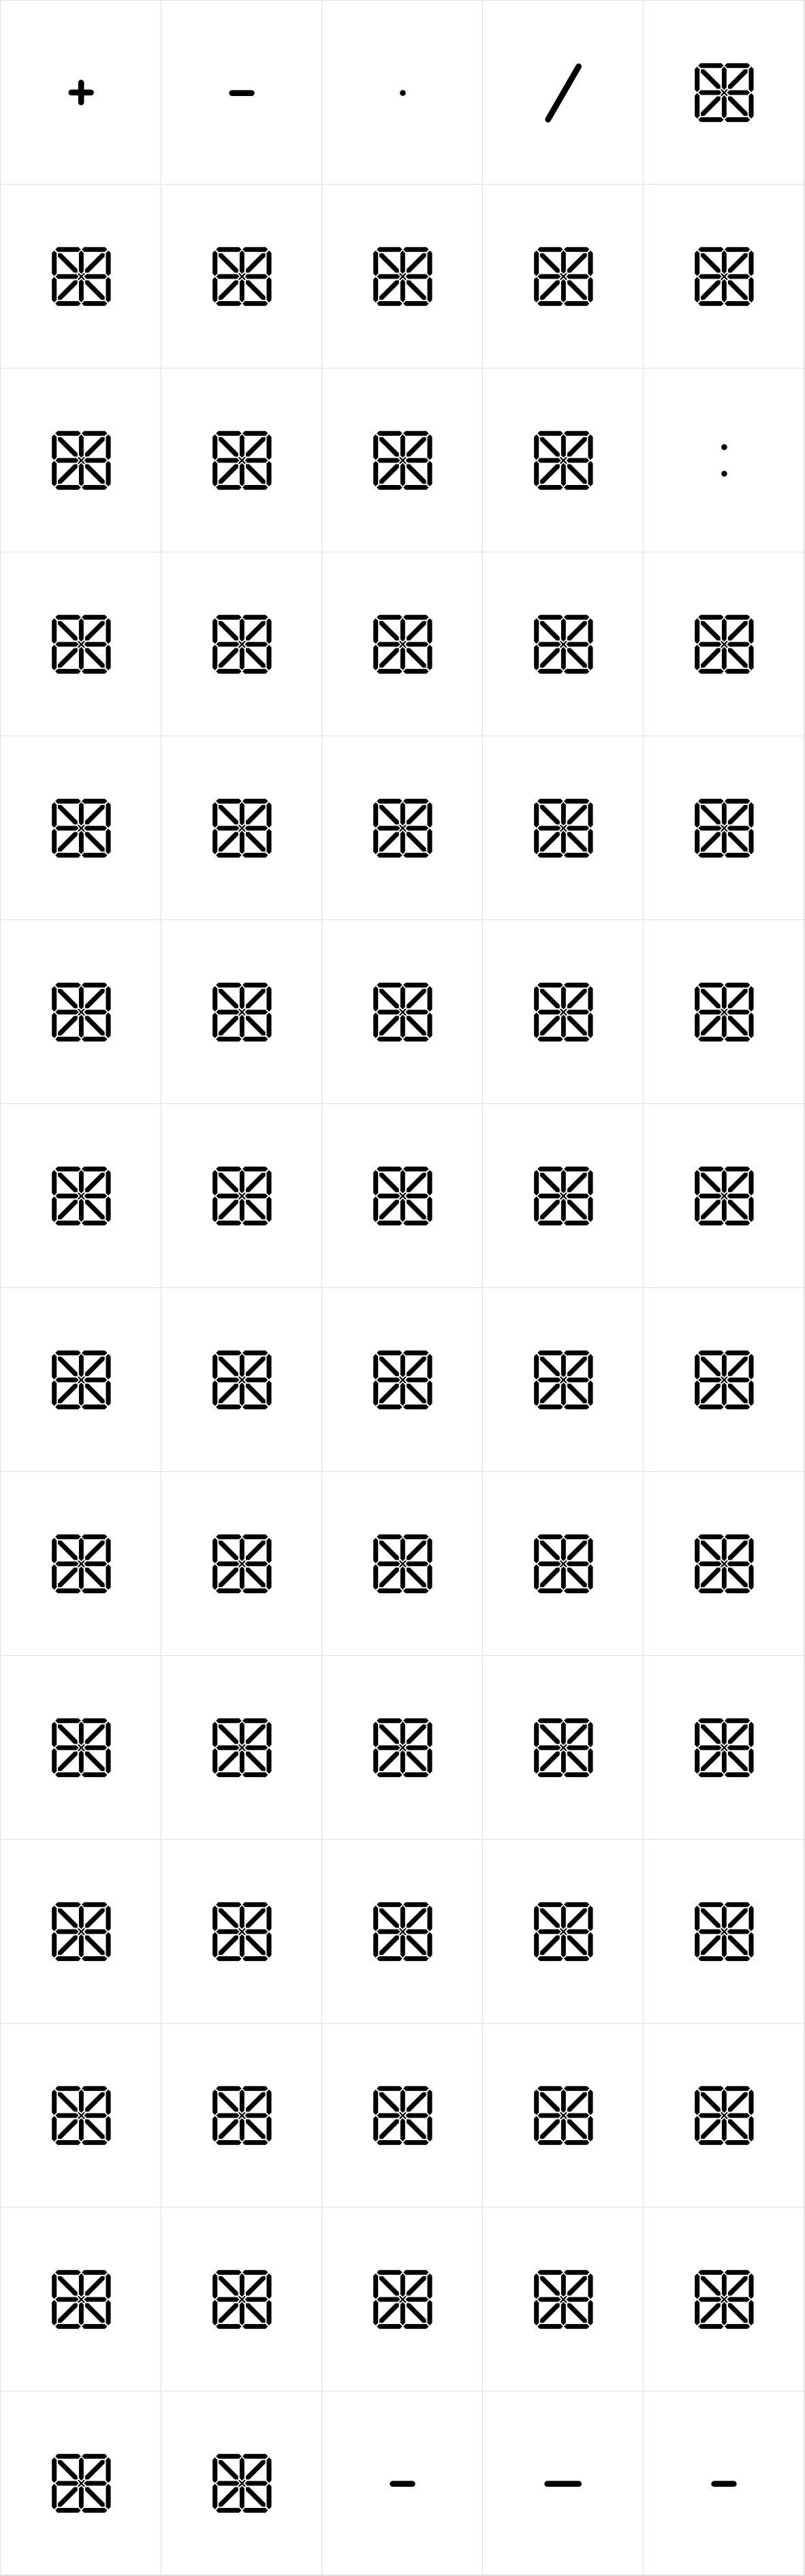 C13 LCD Grid